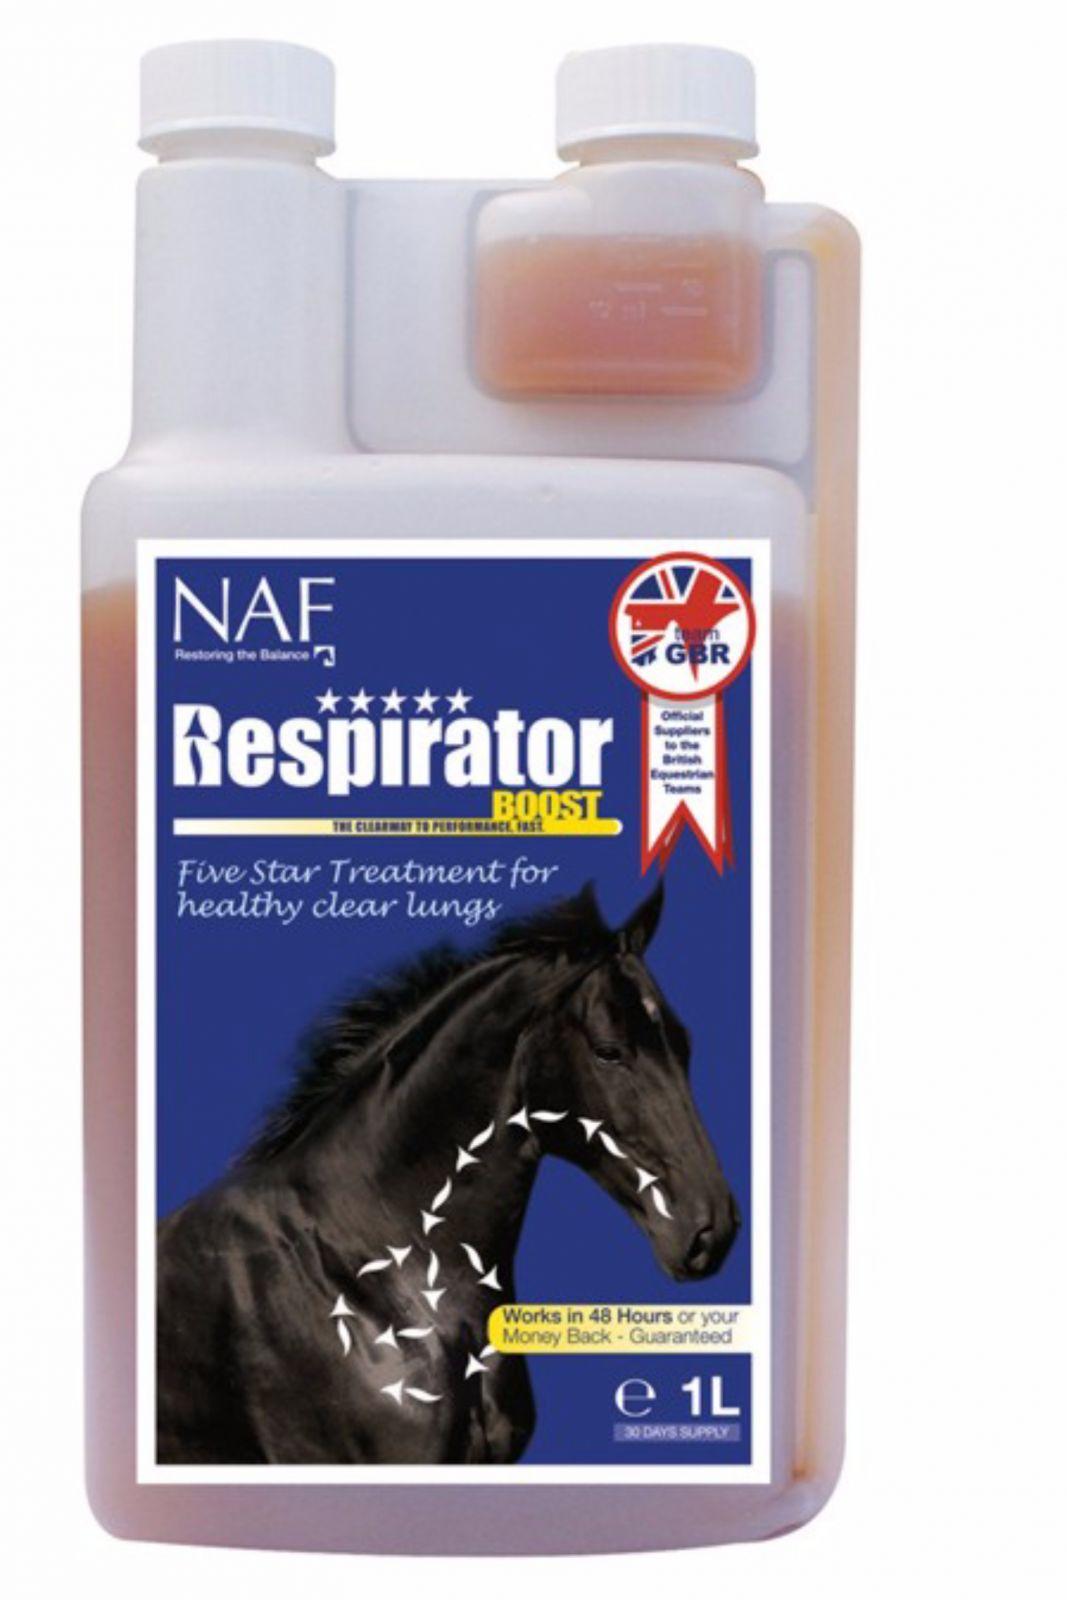 NAF 5 Star Respirator Boost